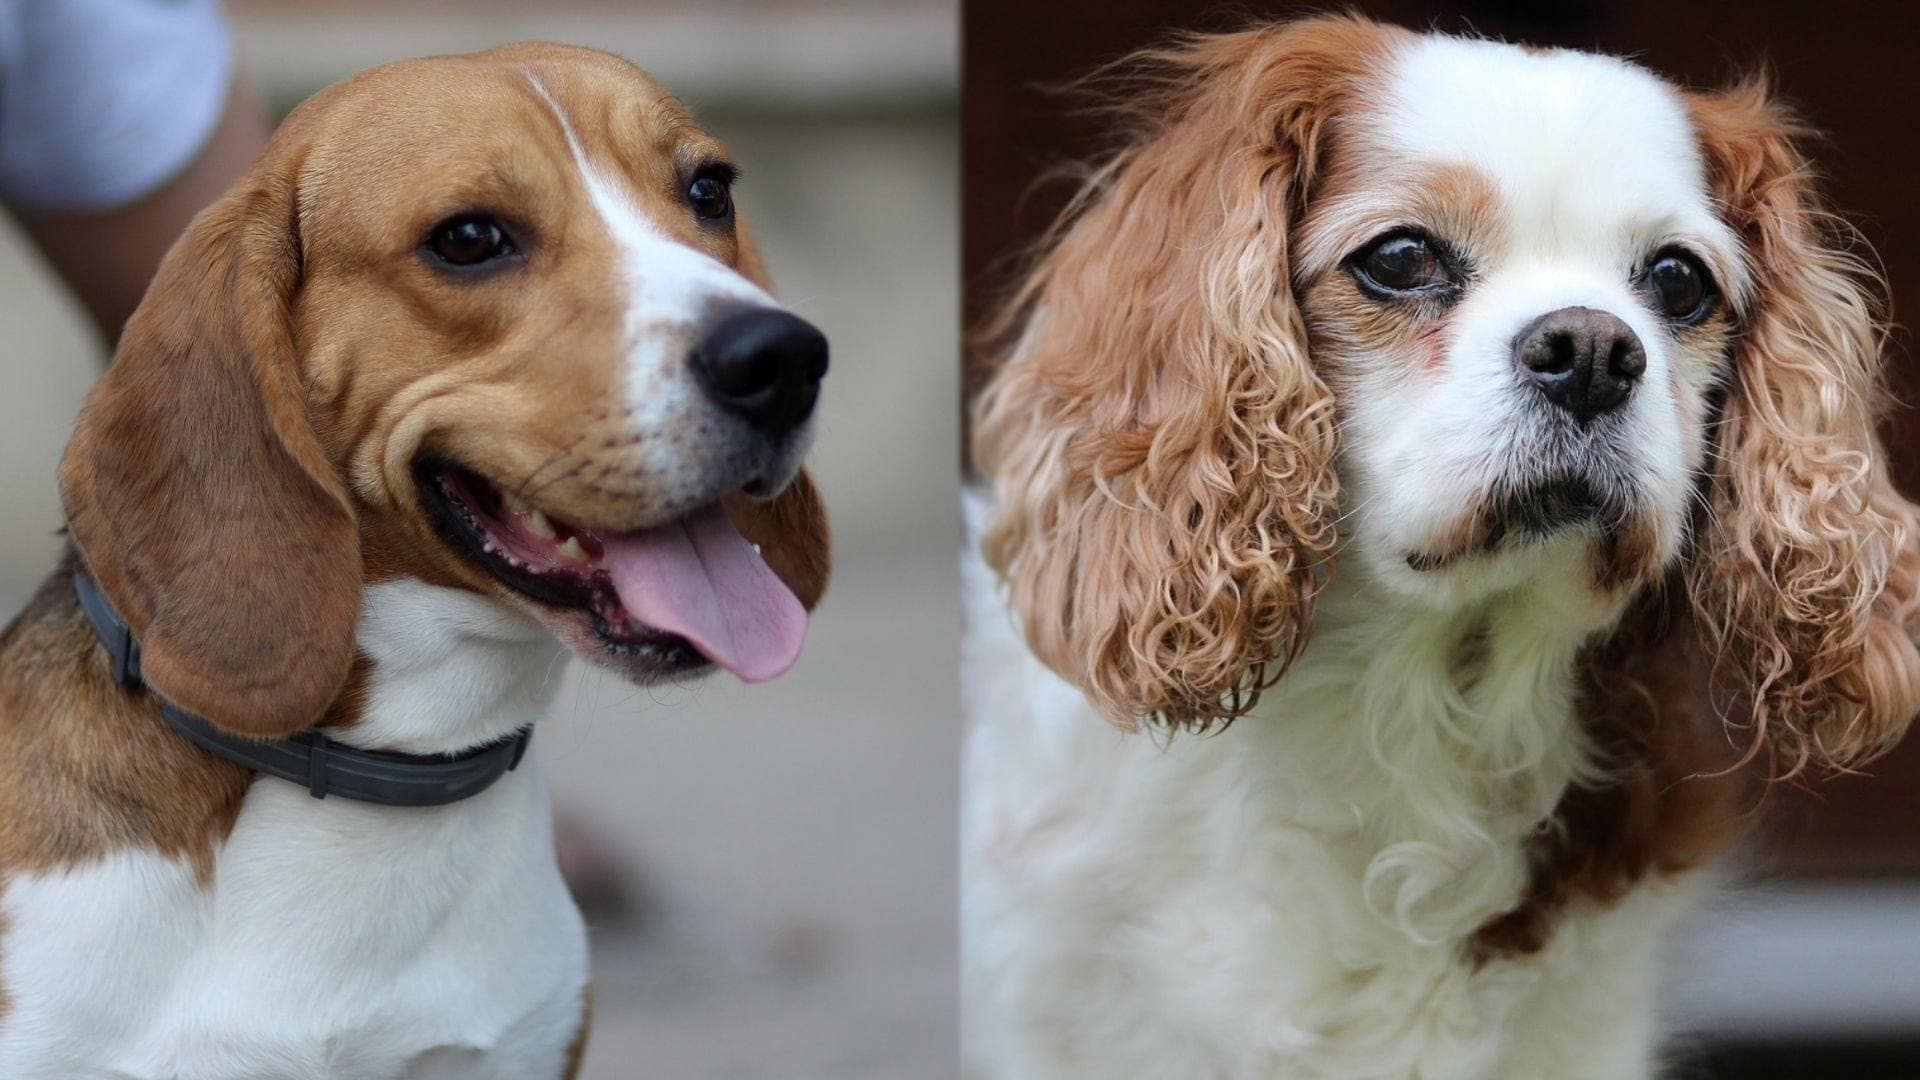 Beaglier - Beagle and Cavalier King Charles Spaniel Mix